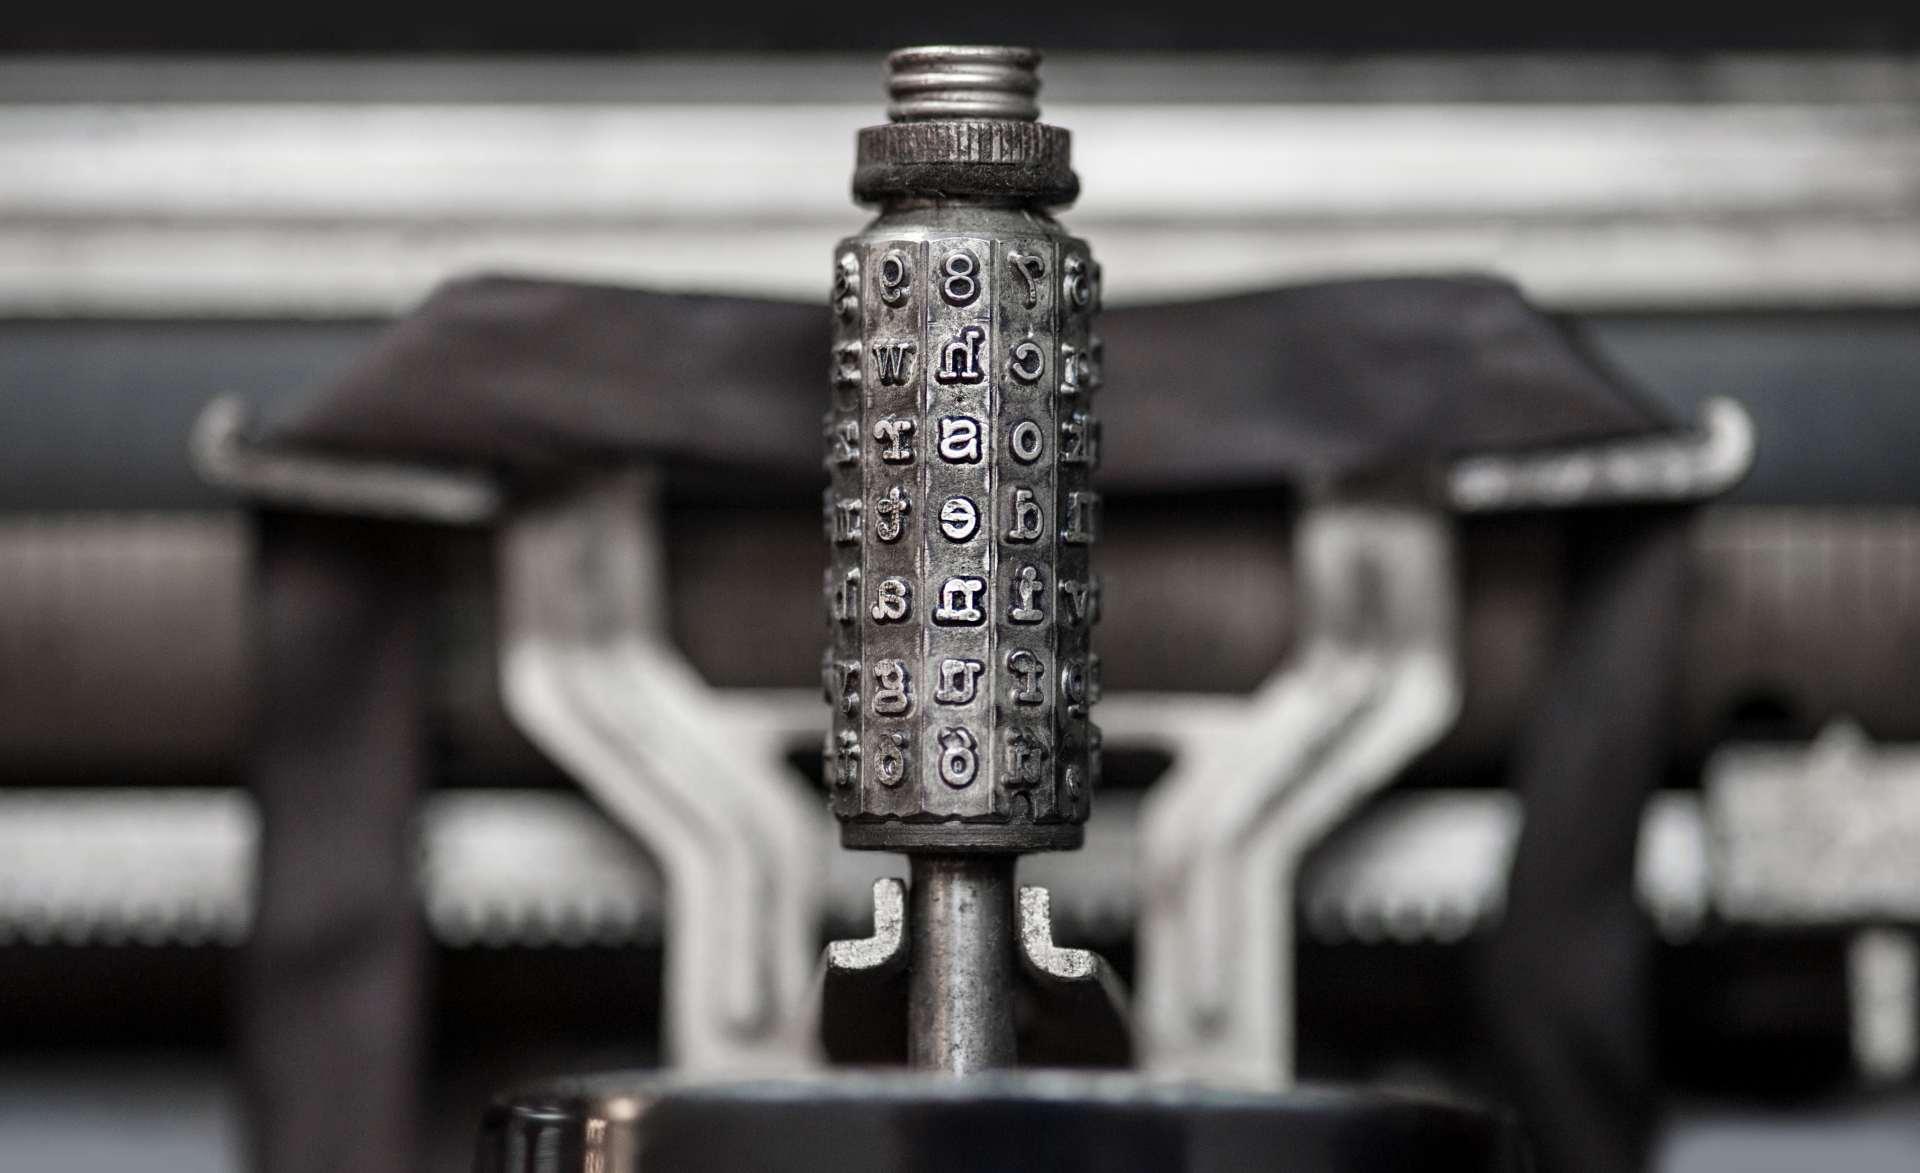 Régies írógép